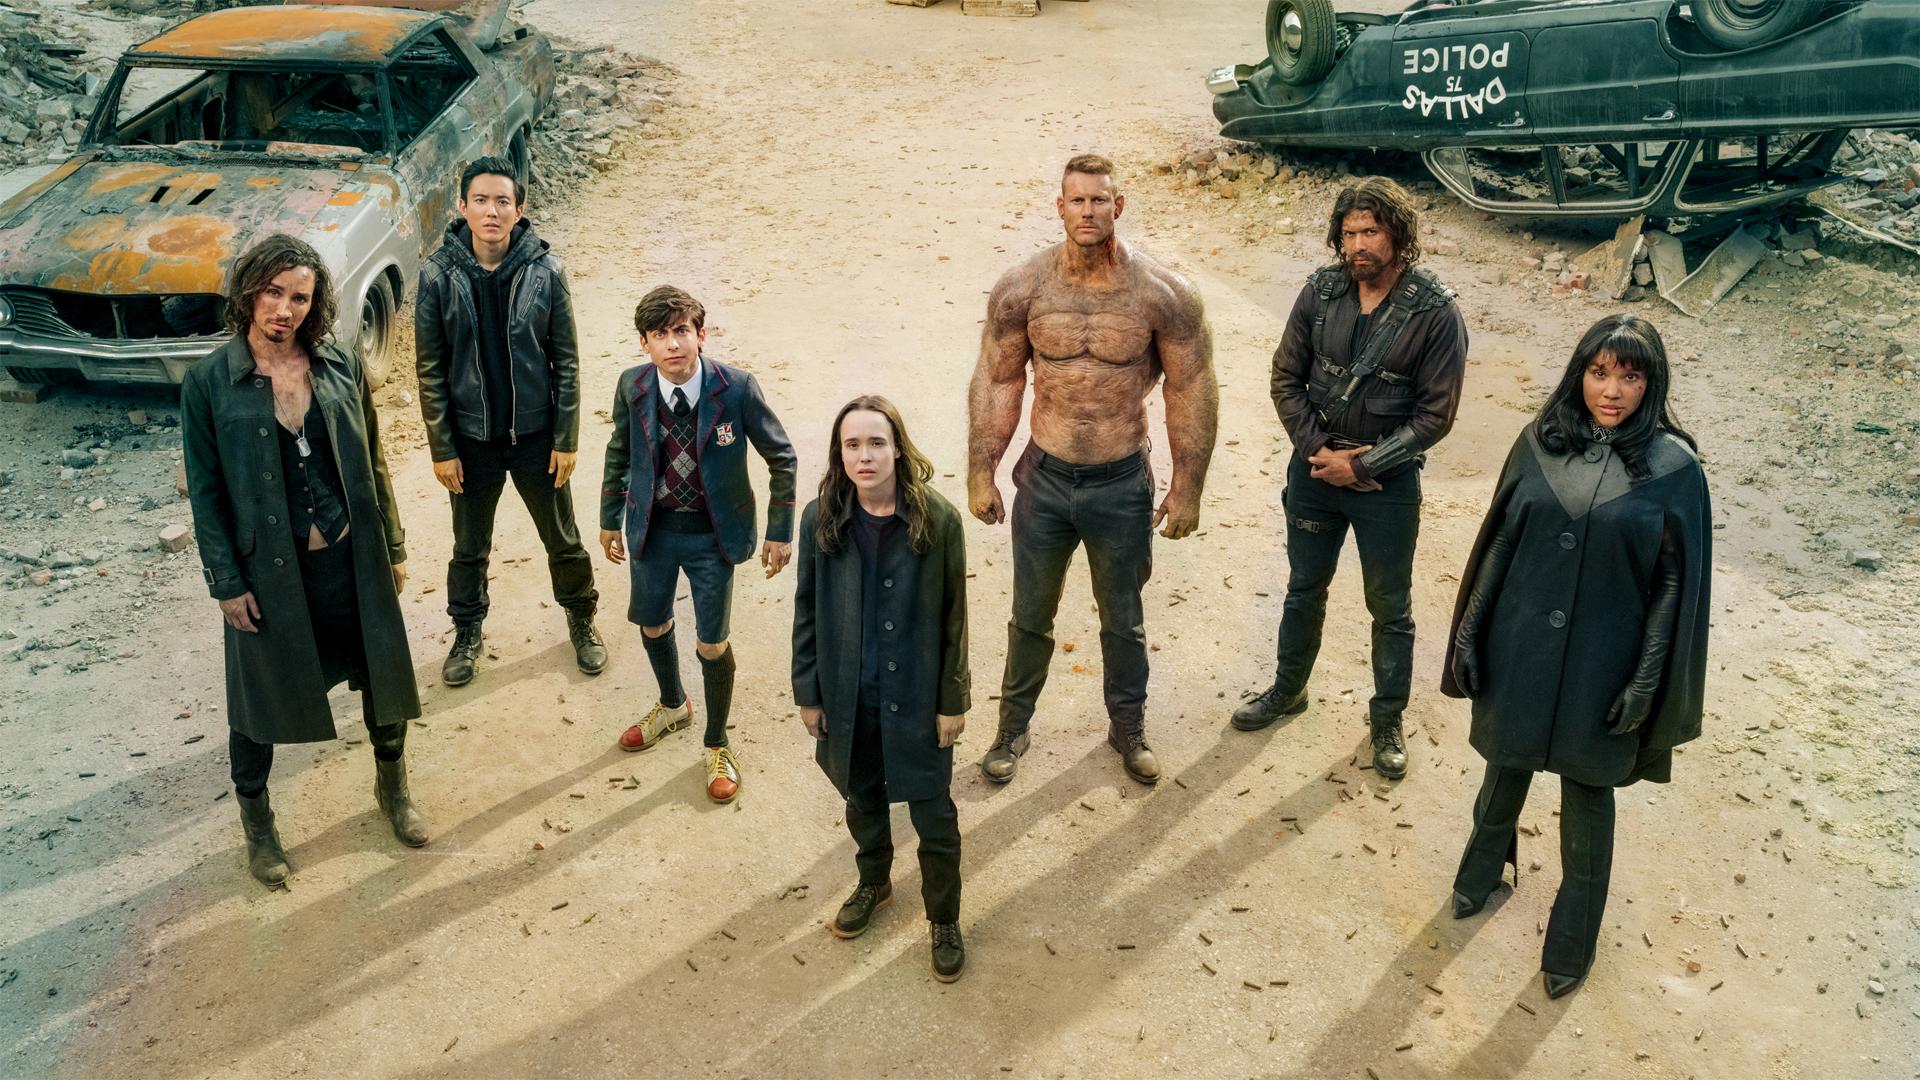 Netflix: The Umbrella Academy Season 3 Premiere Date